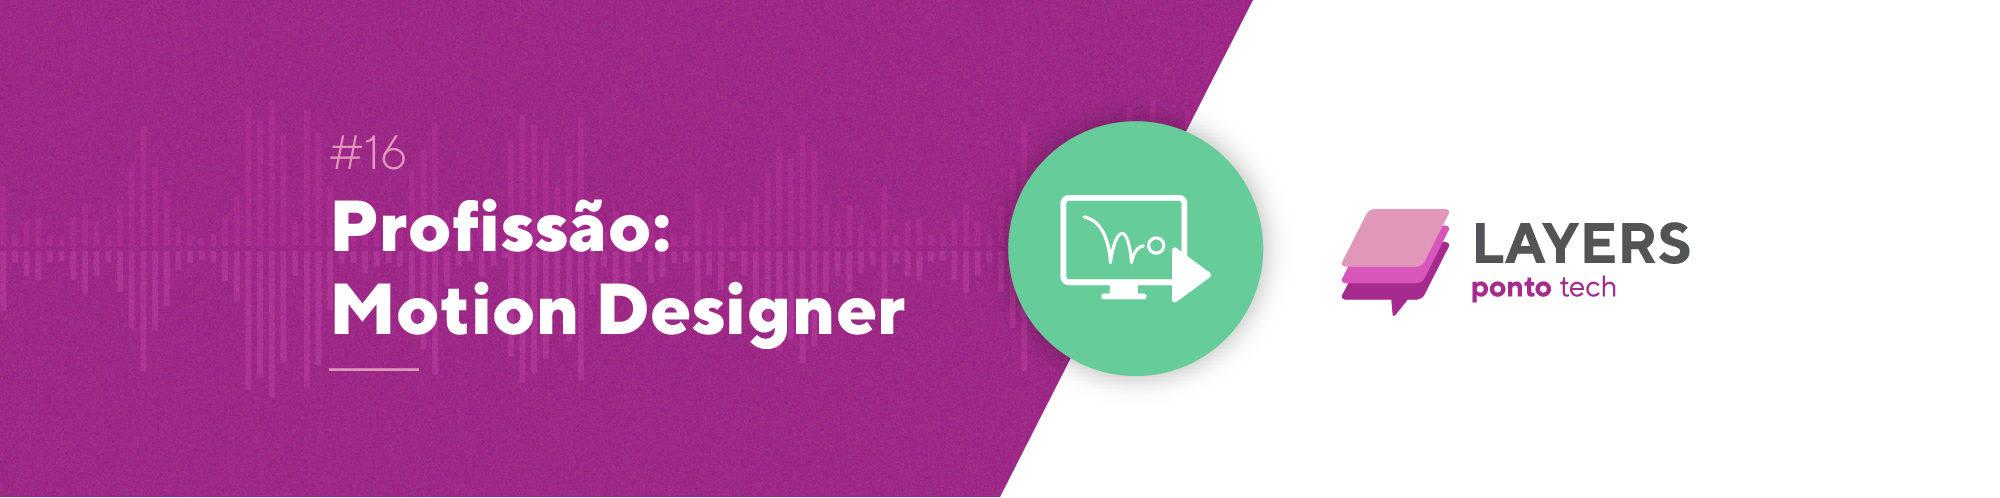 Layerspontotech_ep_16_profissão_motion_designer_100